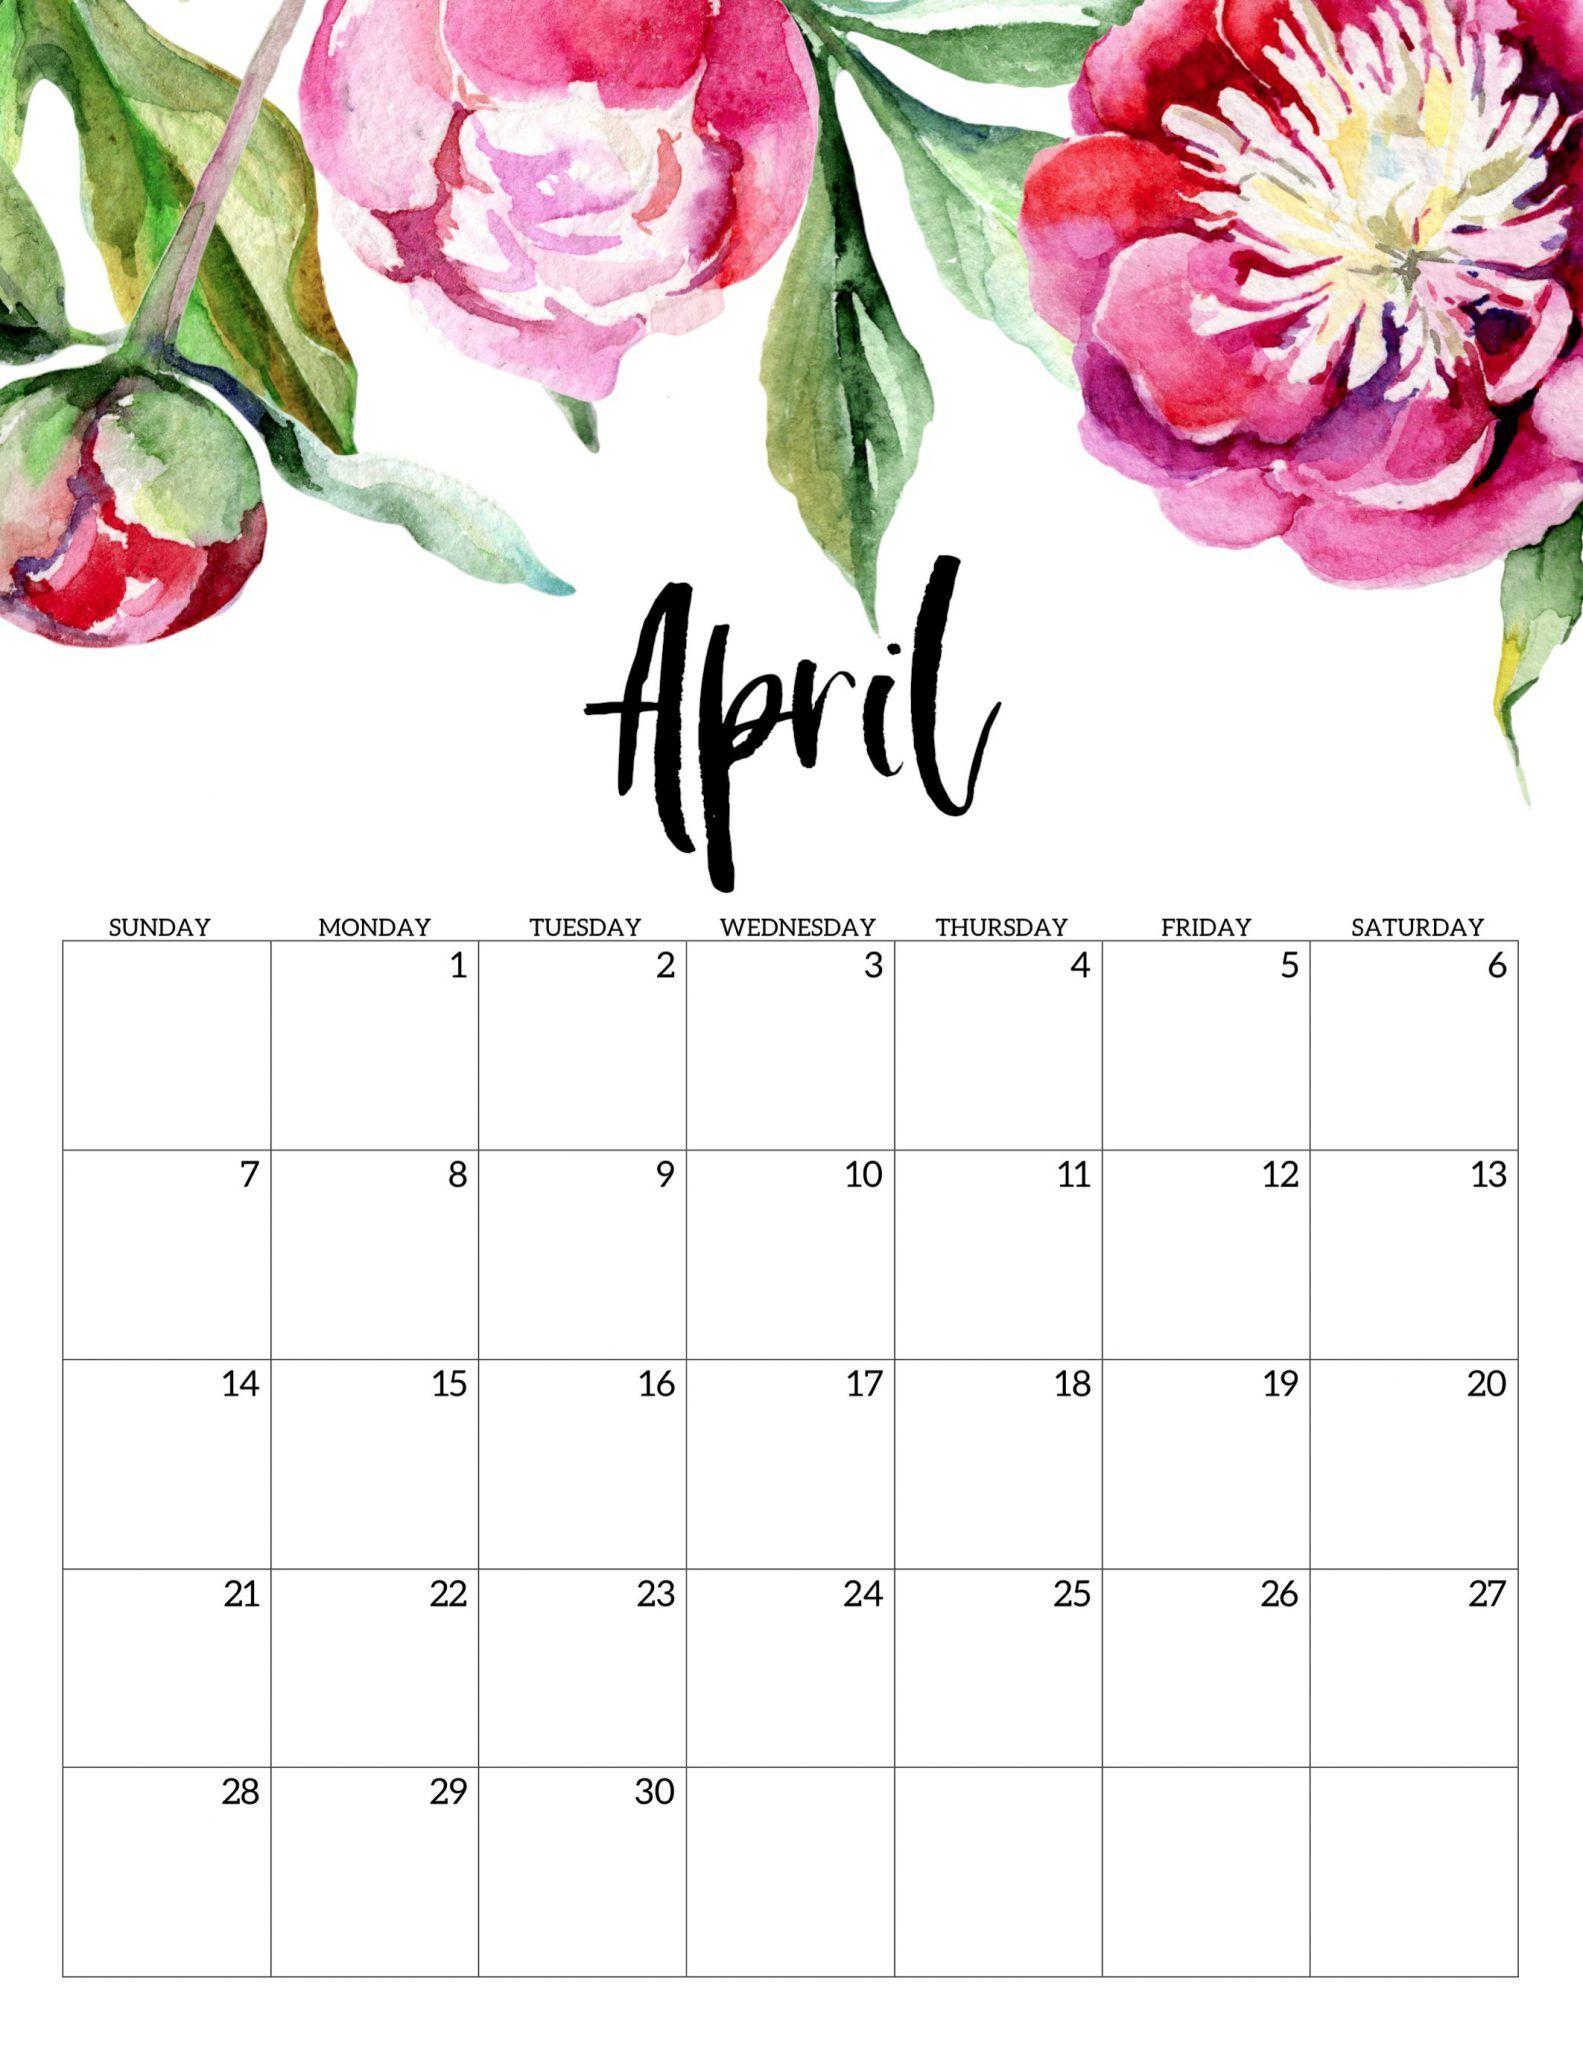 April 2019 Floral Calendar.